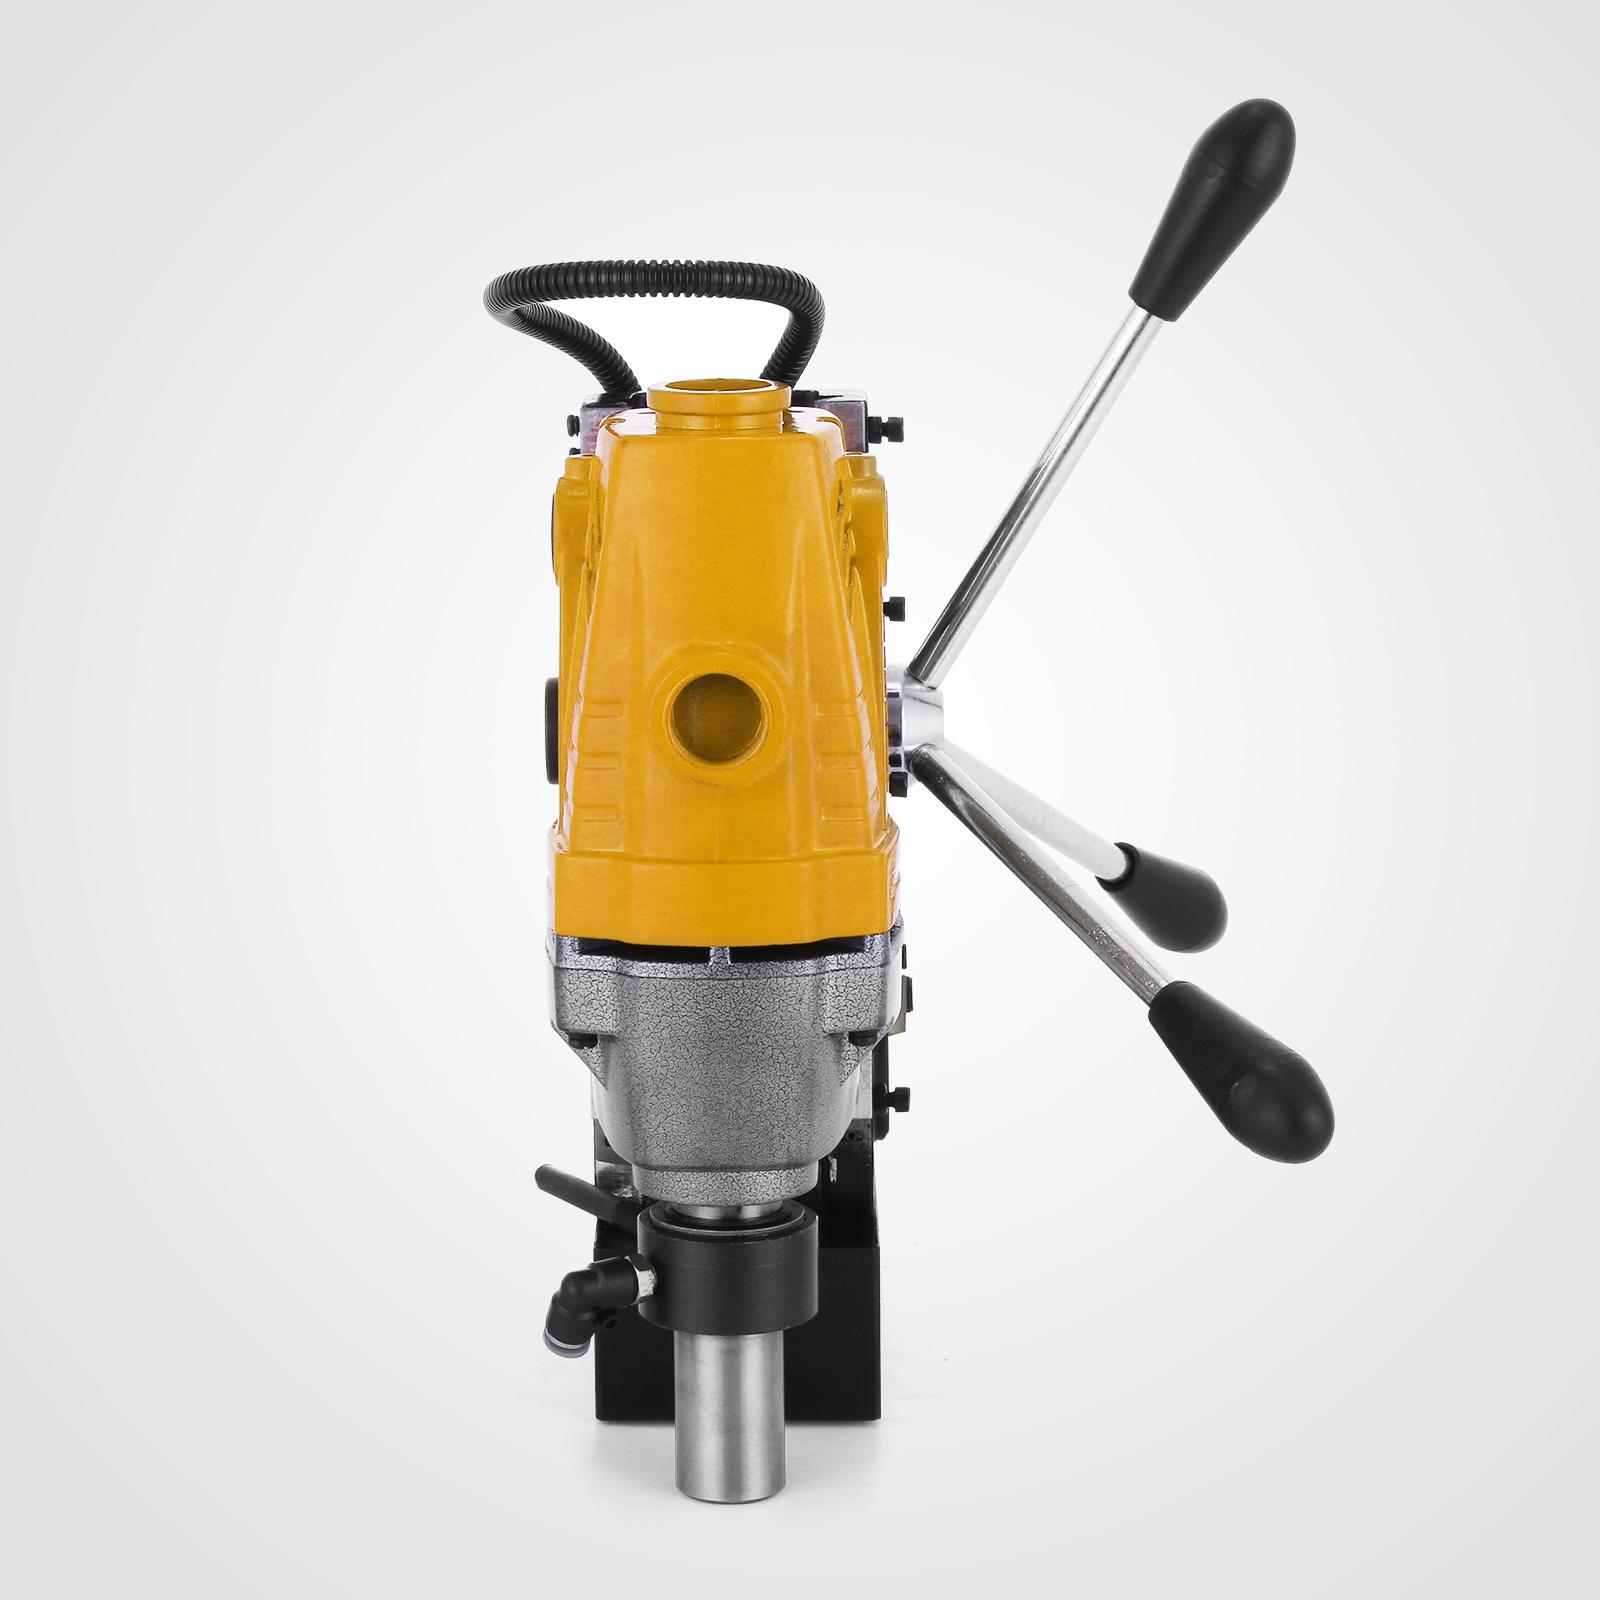 MB23-BRM35-MD40-Trapano-Perforatrice-Carotatore-Fresa-Magnetico-12-40mm-230V miniatura 19